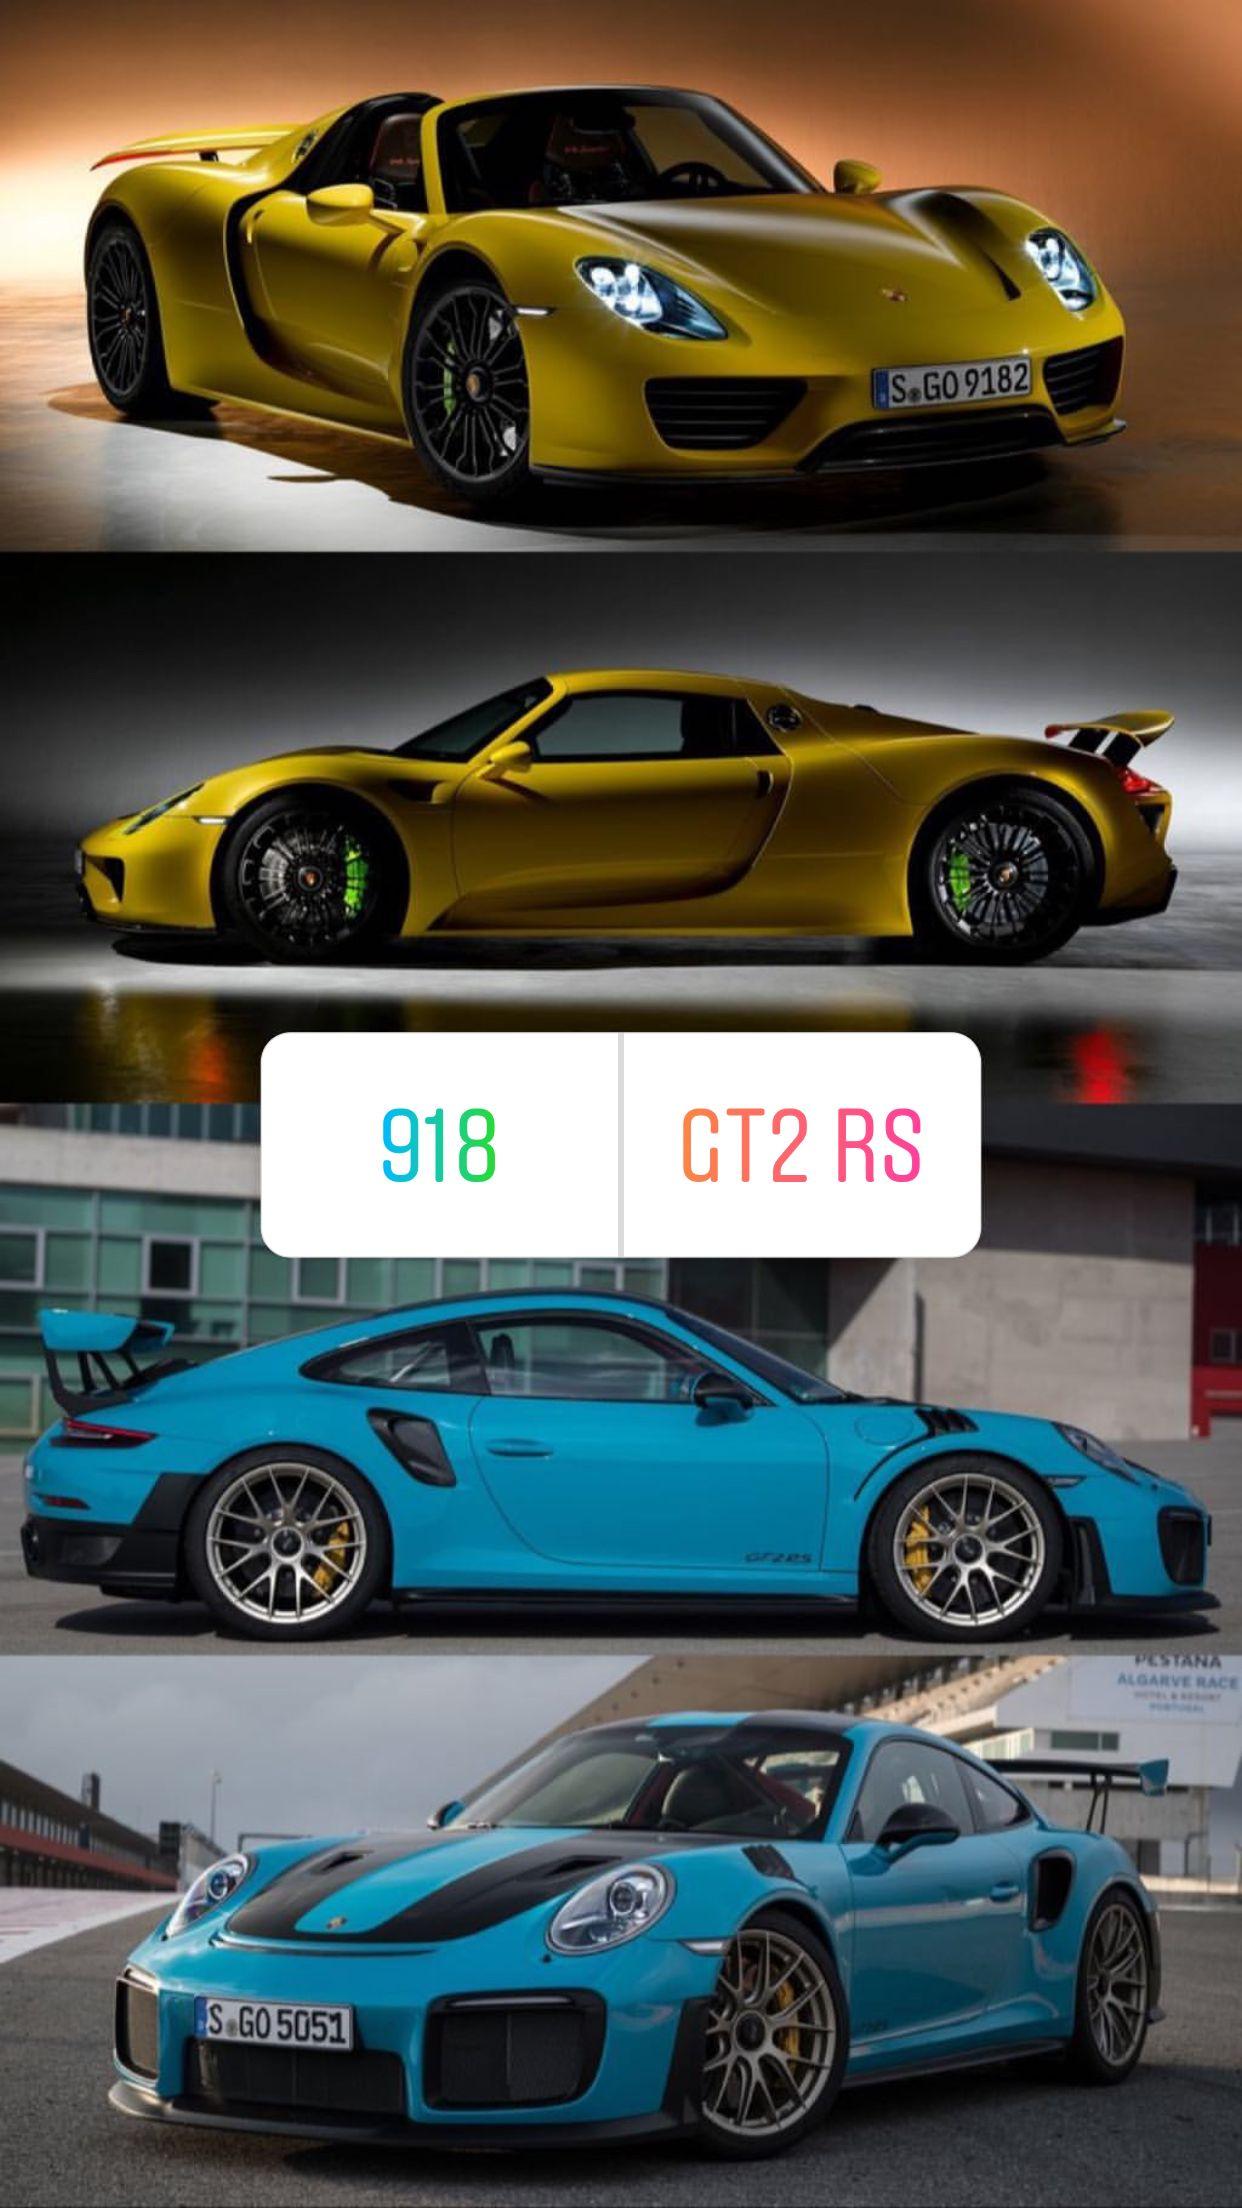 Porsche 918 Or Gt2 Rs Autos Aviones